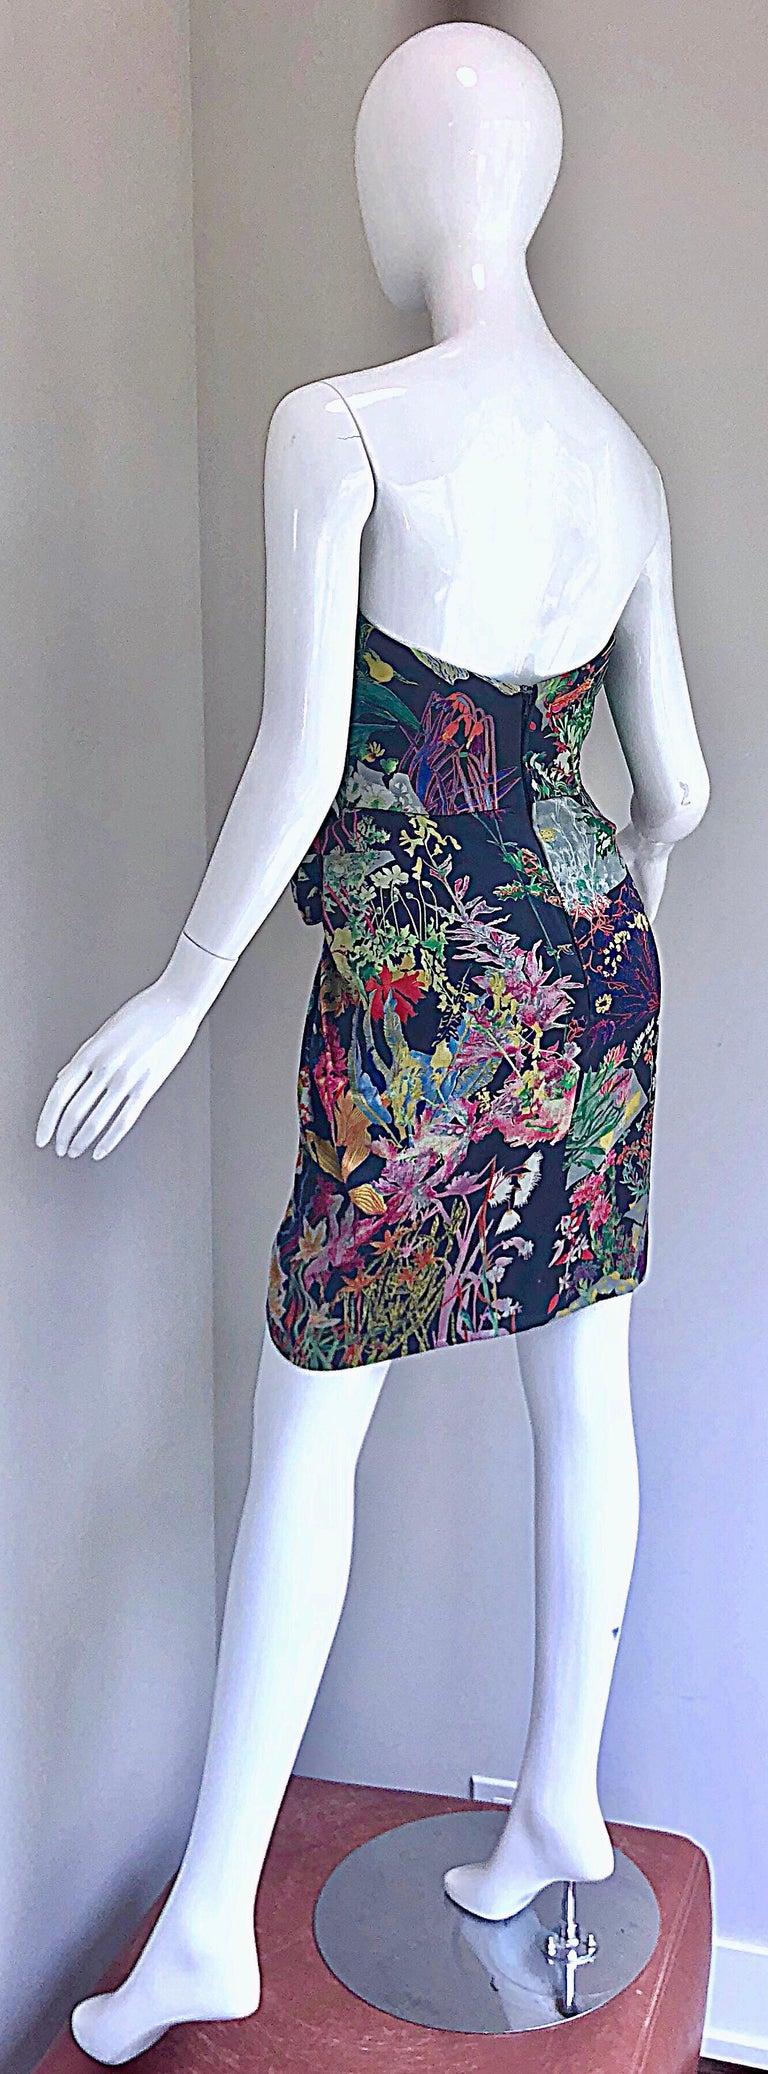 Vintage Vicky Tiel Couture Botanical Print 80s Size 6 / 8 Silk Strapless Dress For Sale 6